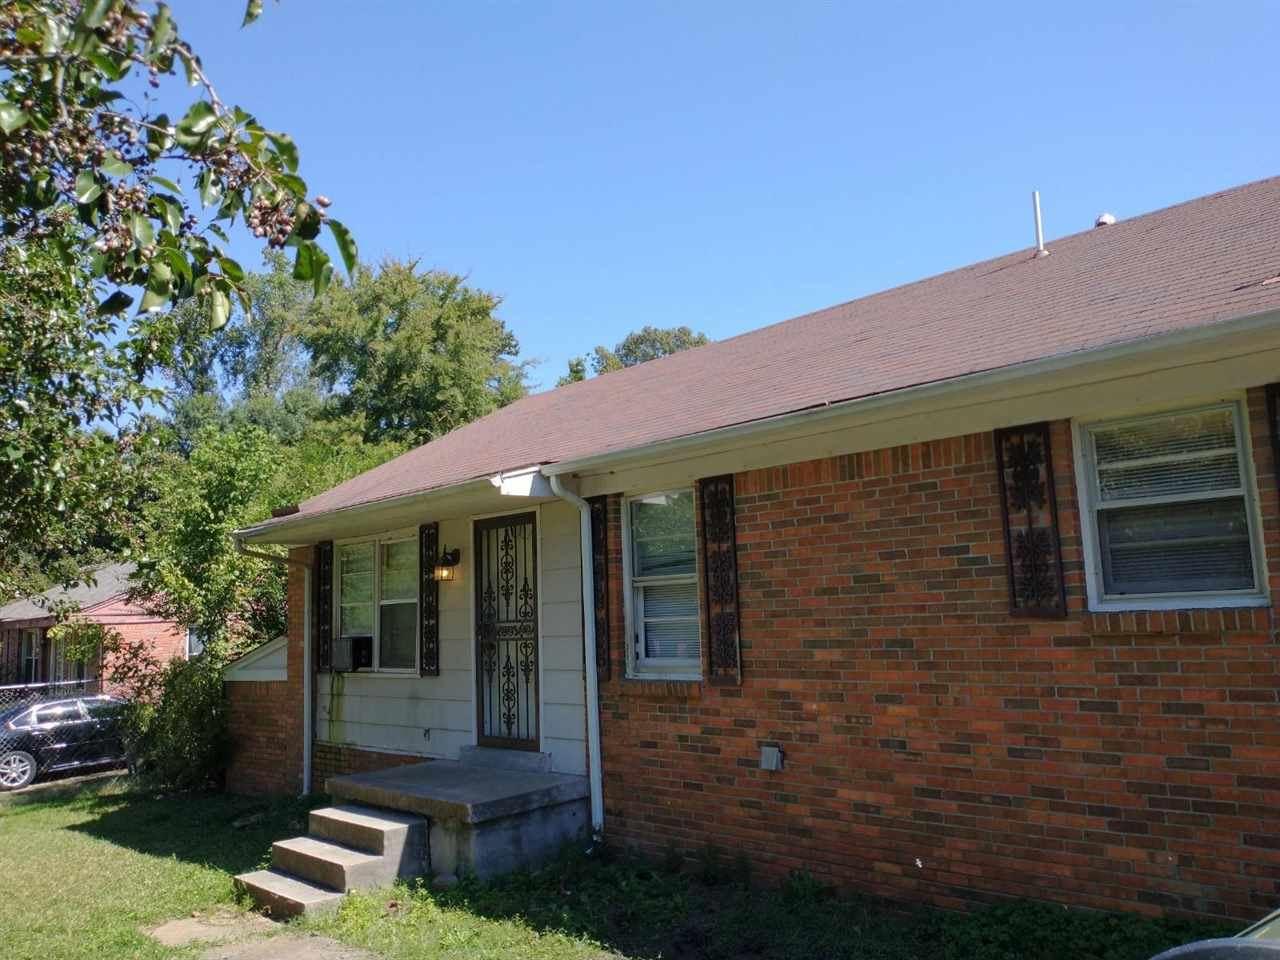 4584 PERCY RD, Memphis, TN 38109 - #: 10110352